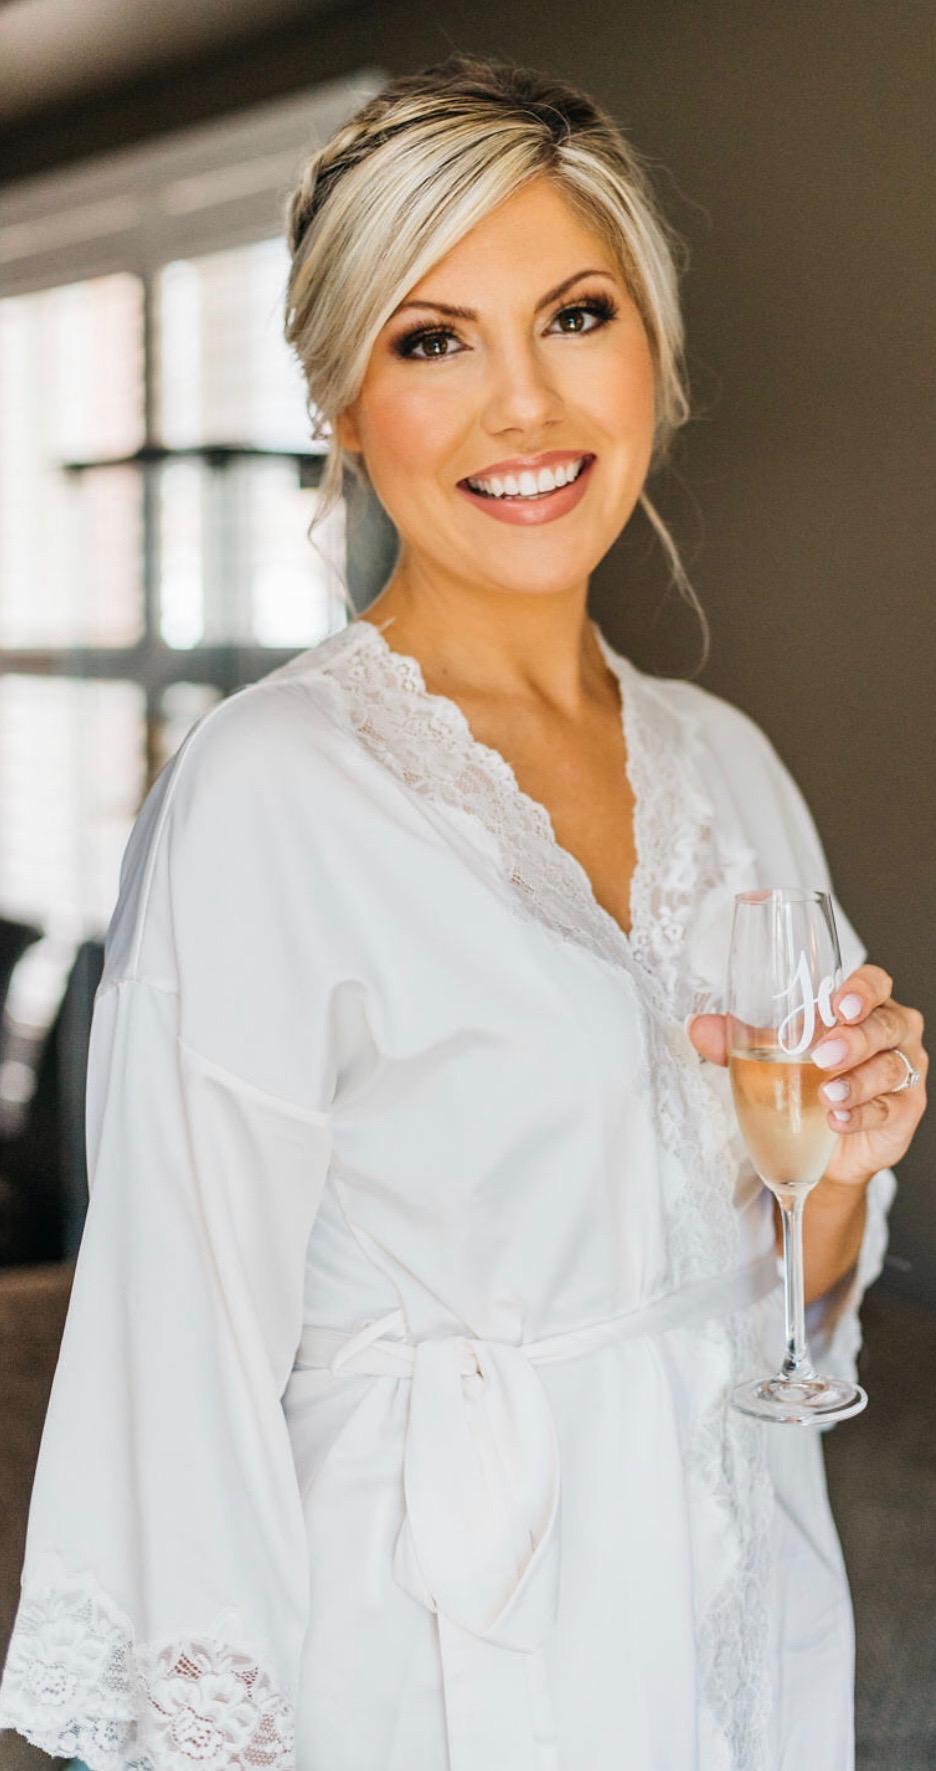 GET GORGEOUS BRONZED SKIN - Organic Spray Tanning